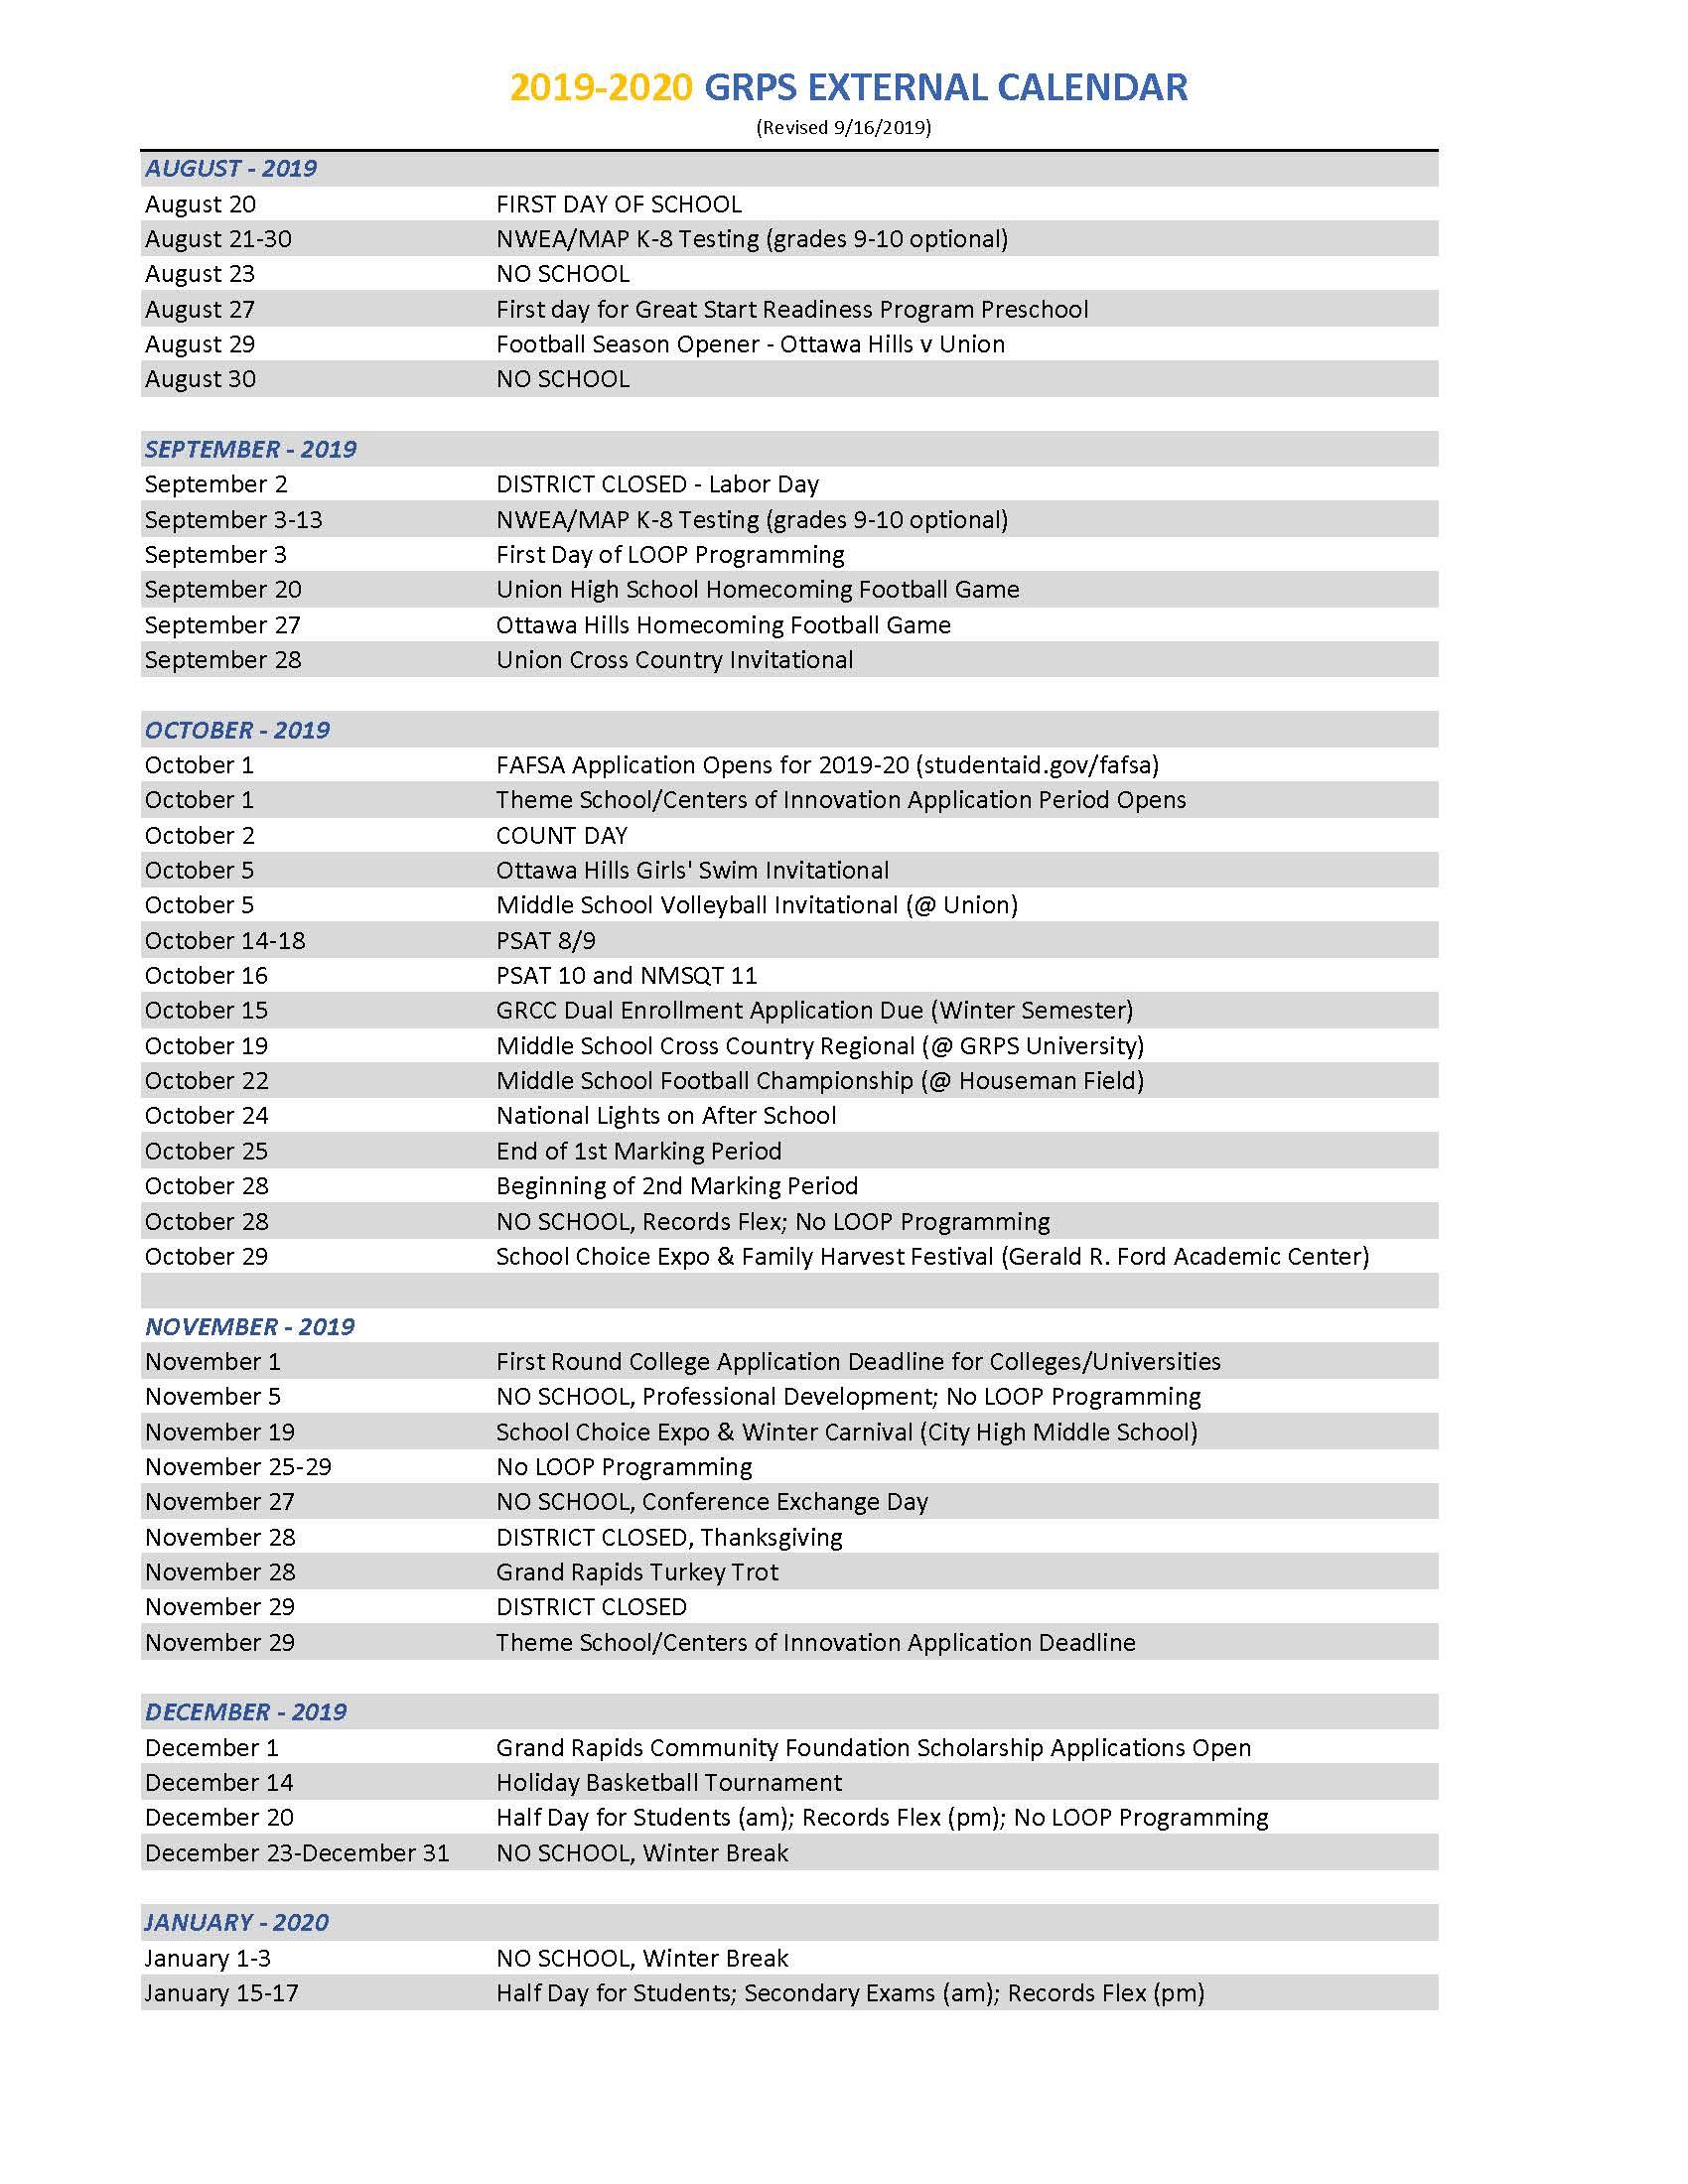 2019-2020 District Calendar throughout Spring Break For Grand Rapids Public Schools